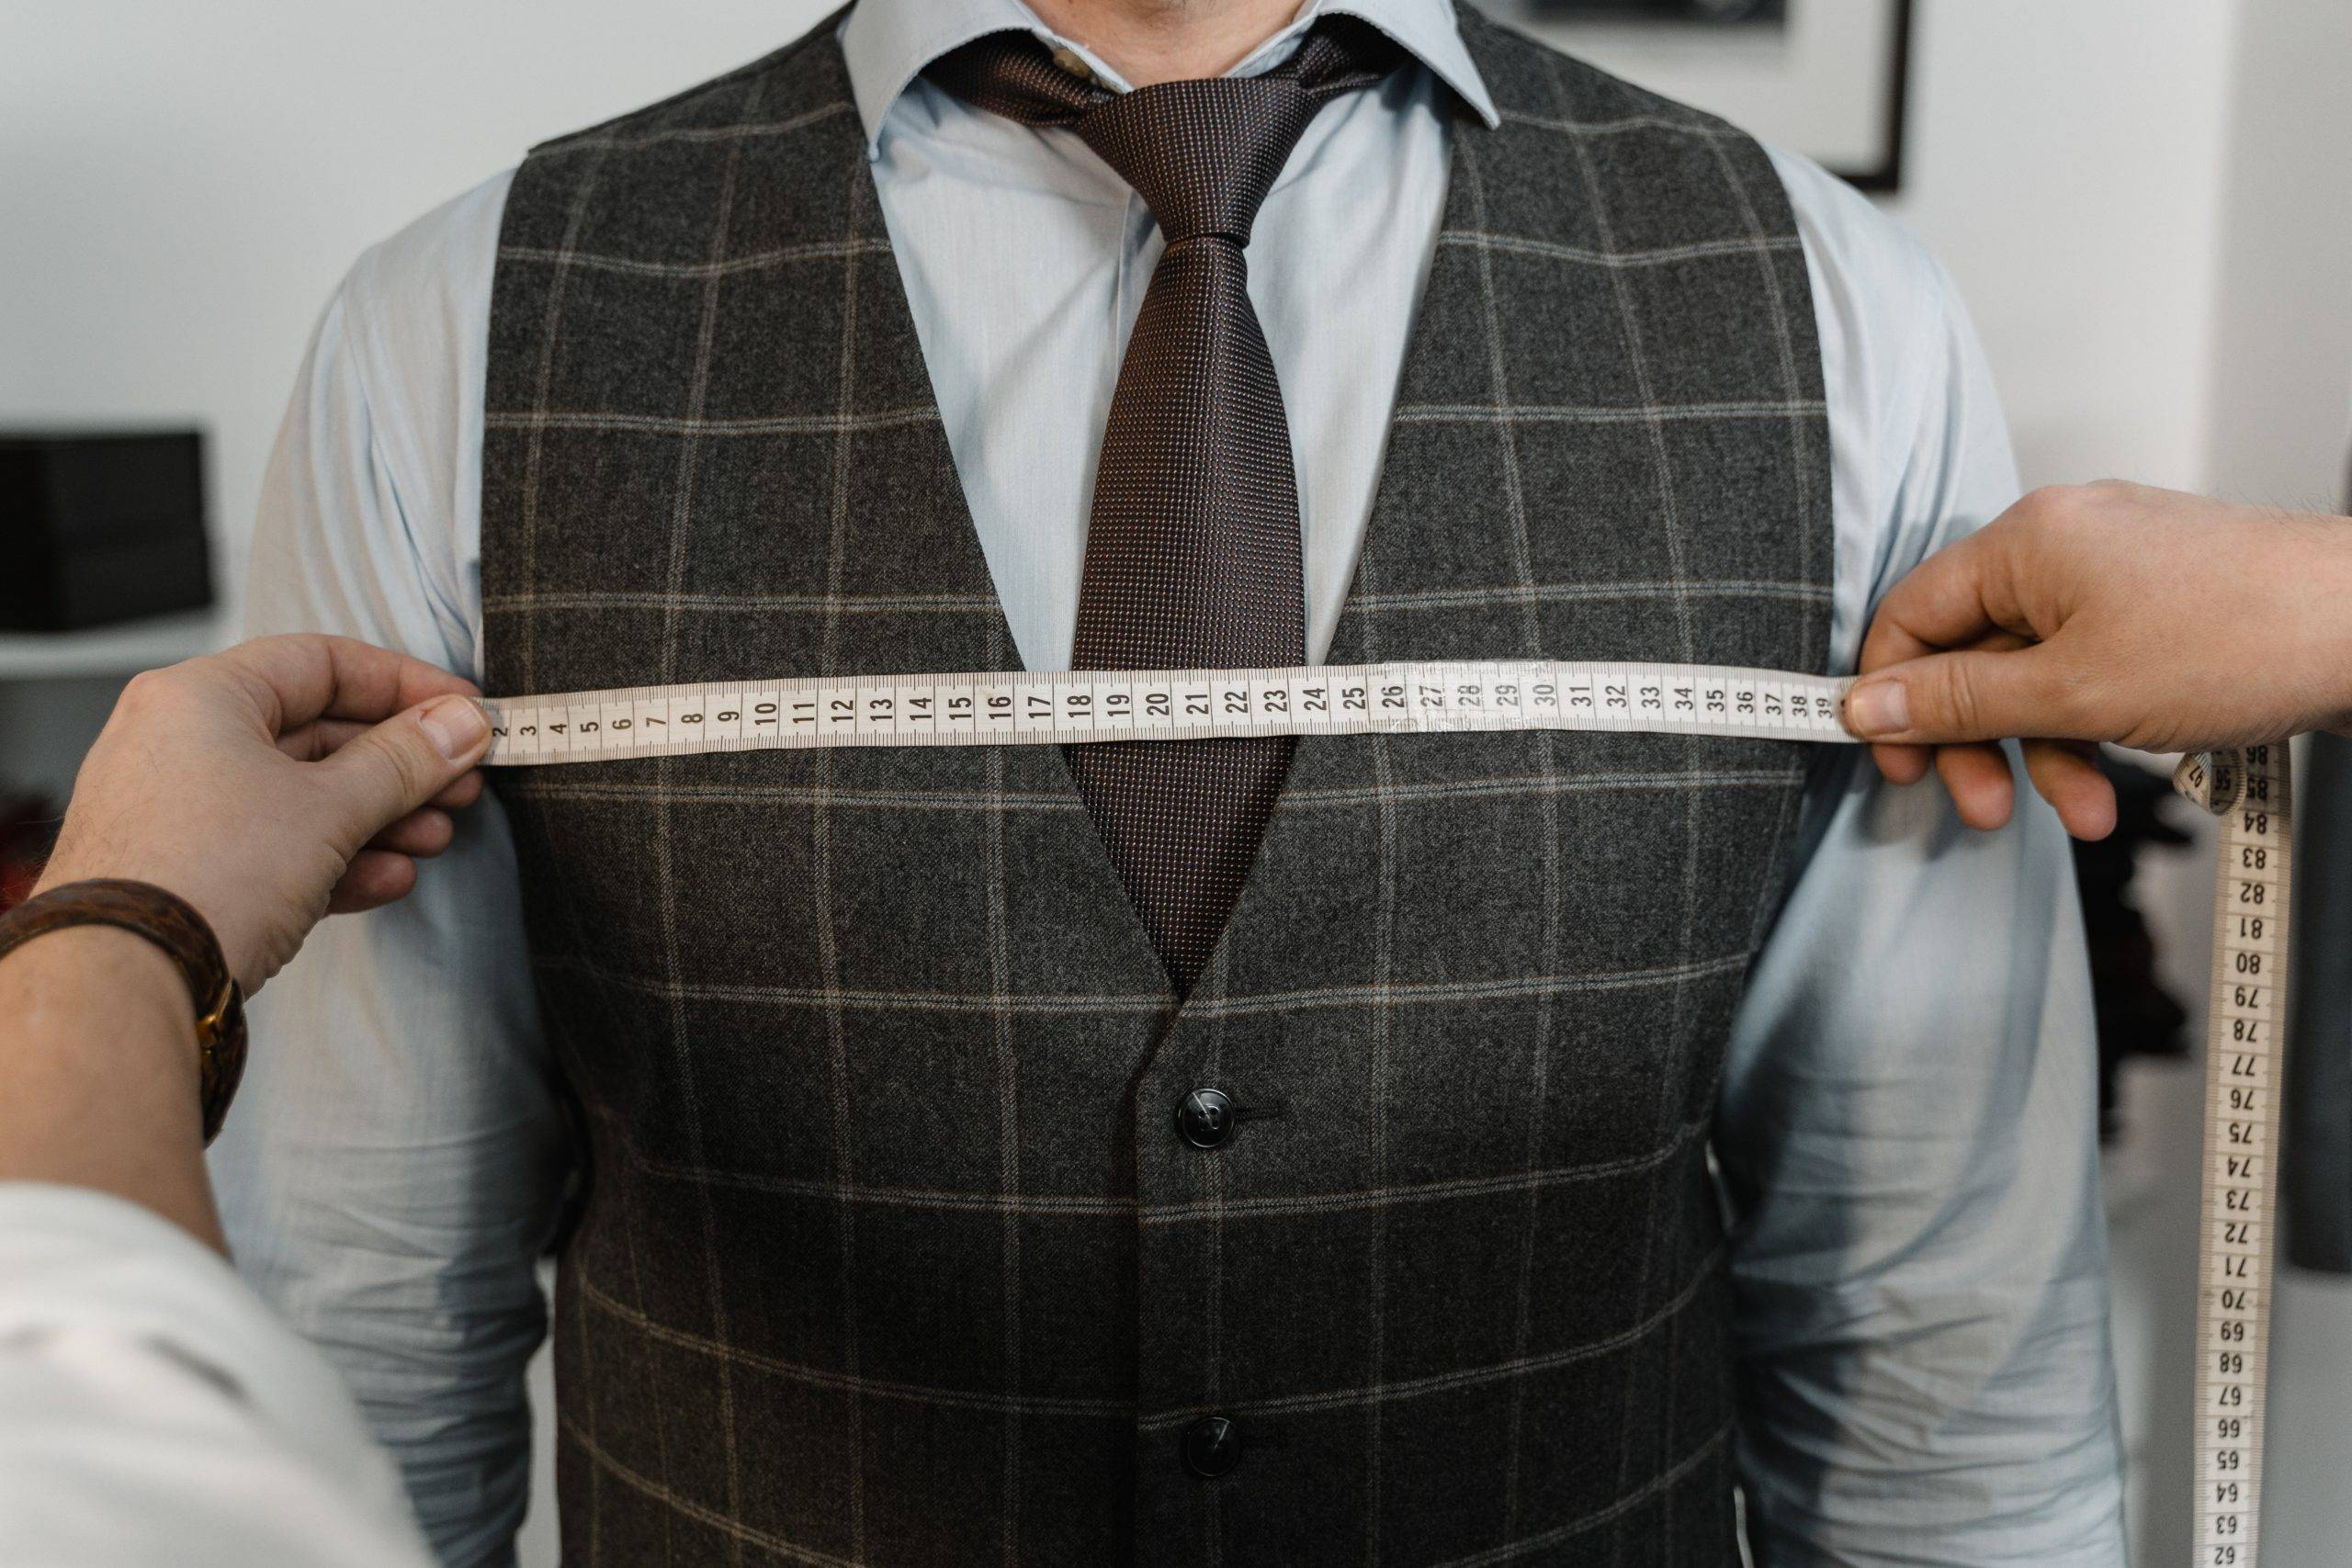 Tape measure across chest